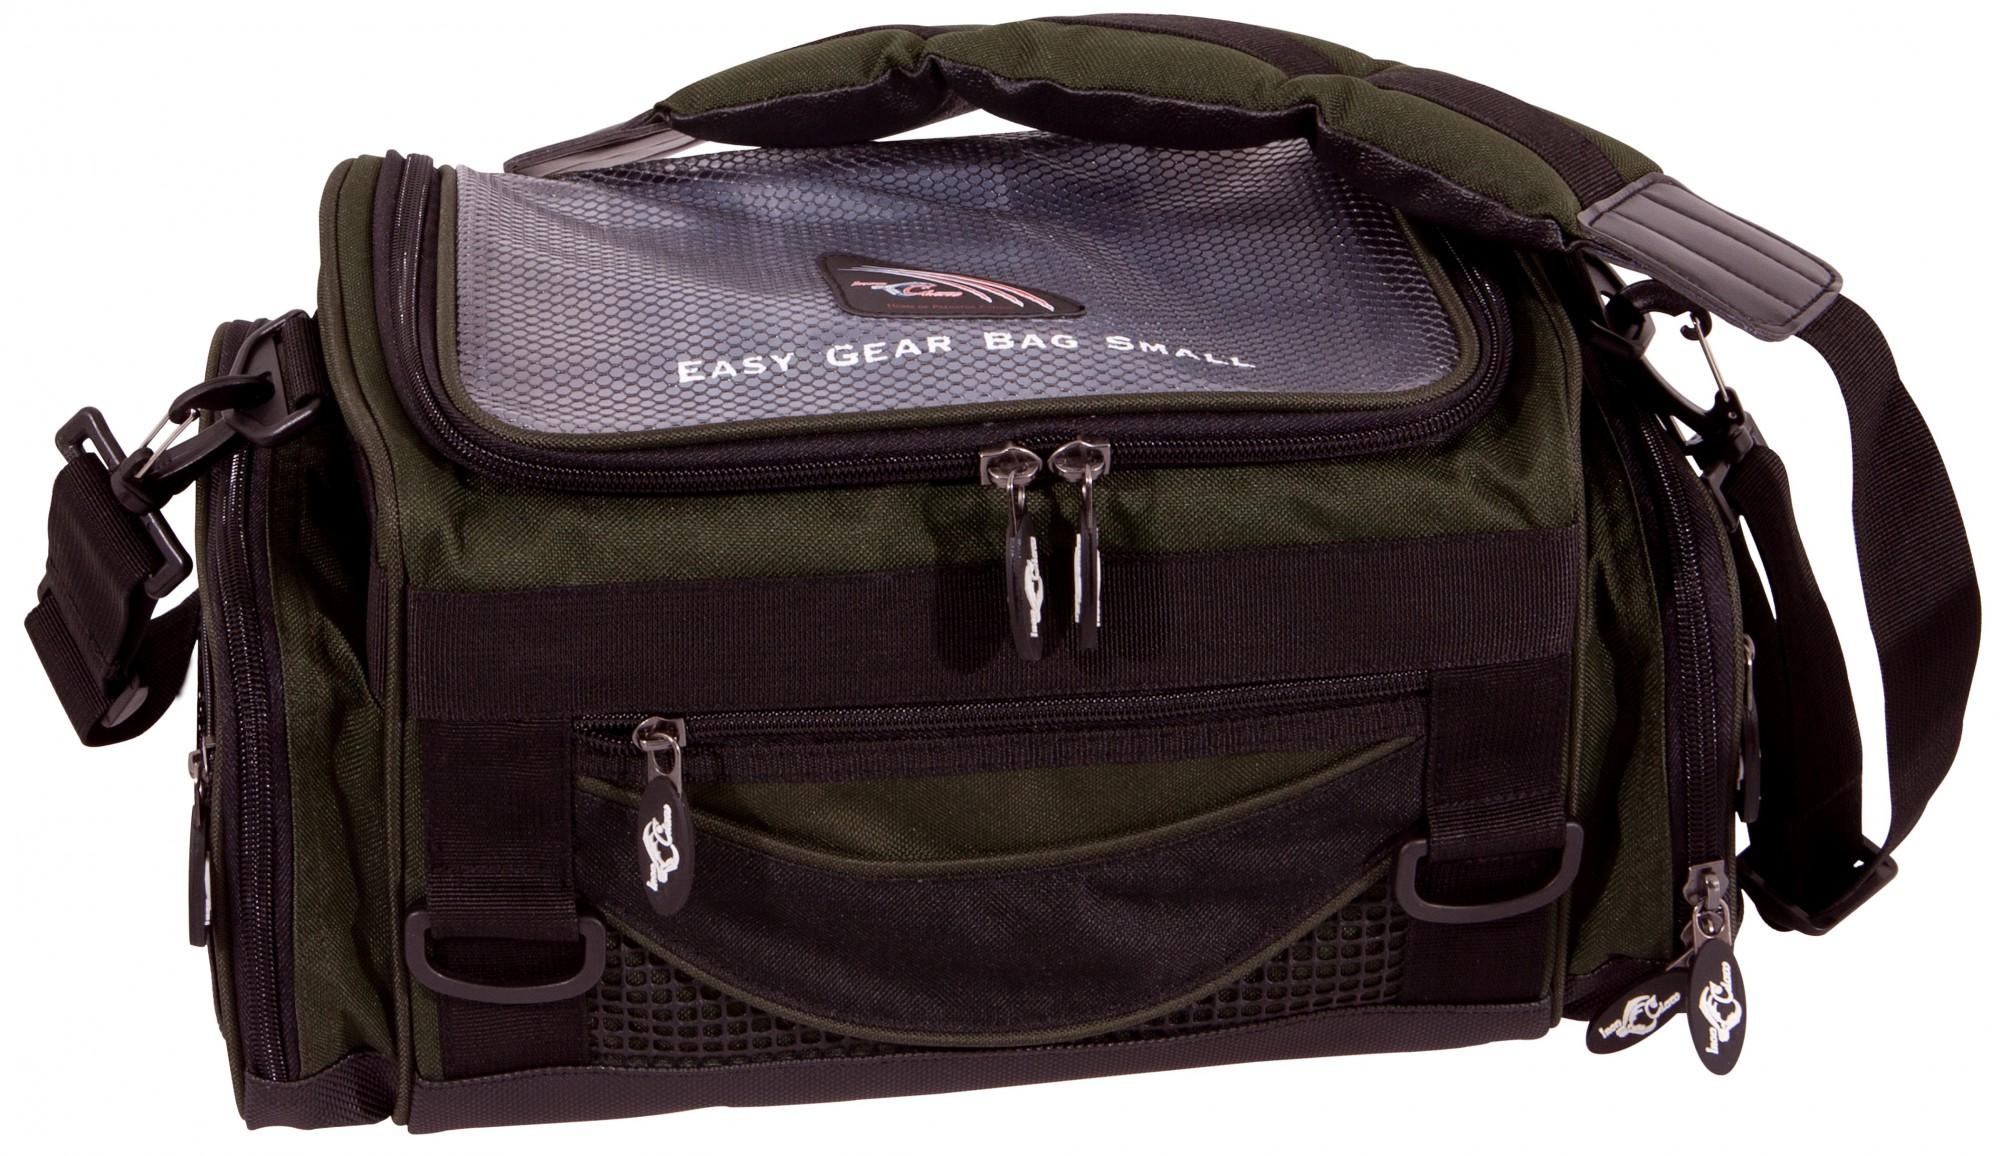 iron-claw-easy-gear-bag-small-4-boxen